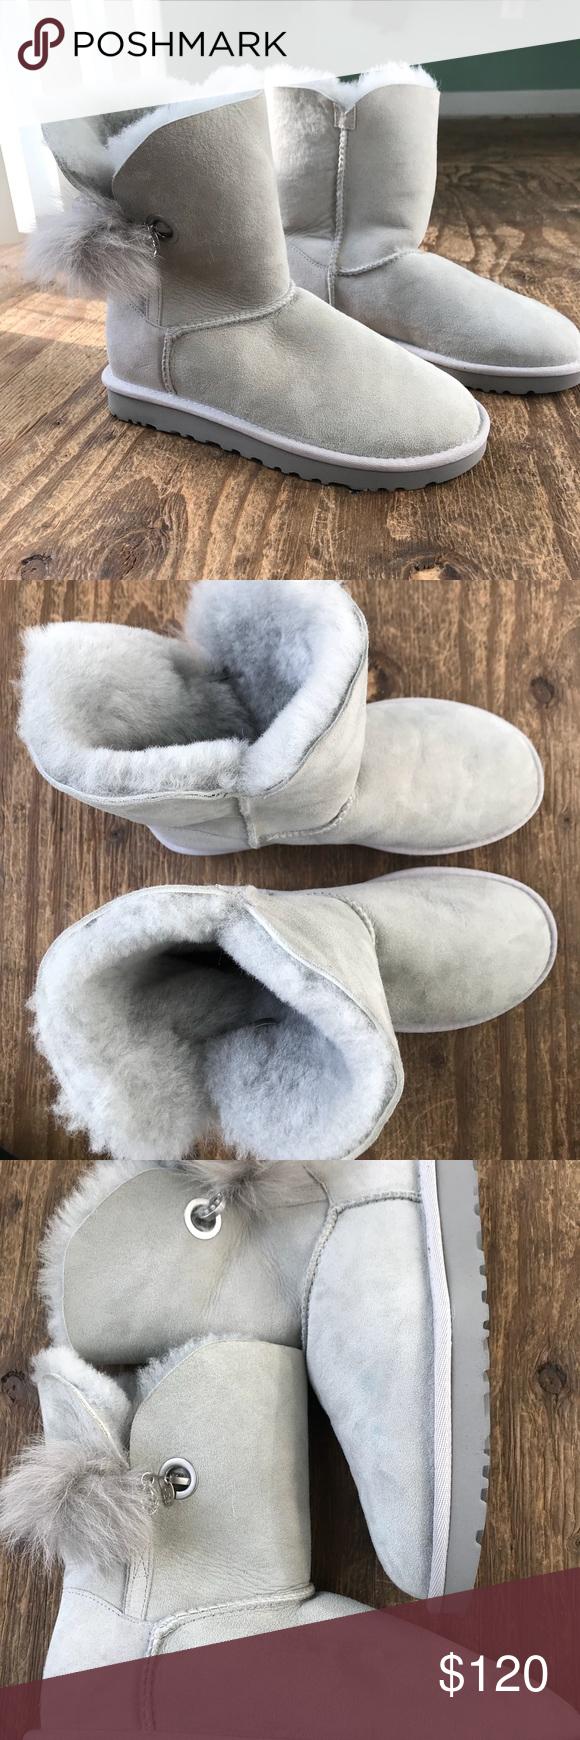 3b400849c89 Ugg Boots- Irina UGG-Irina boots in grey violet. Size women 7. UGG ...